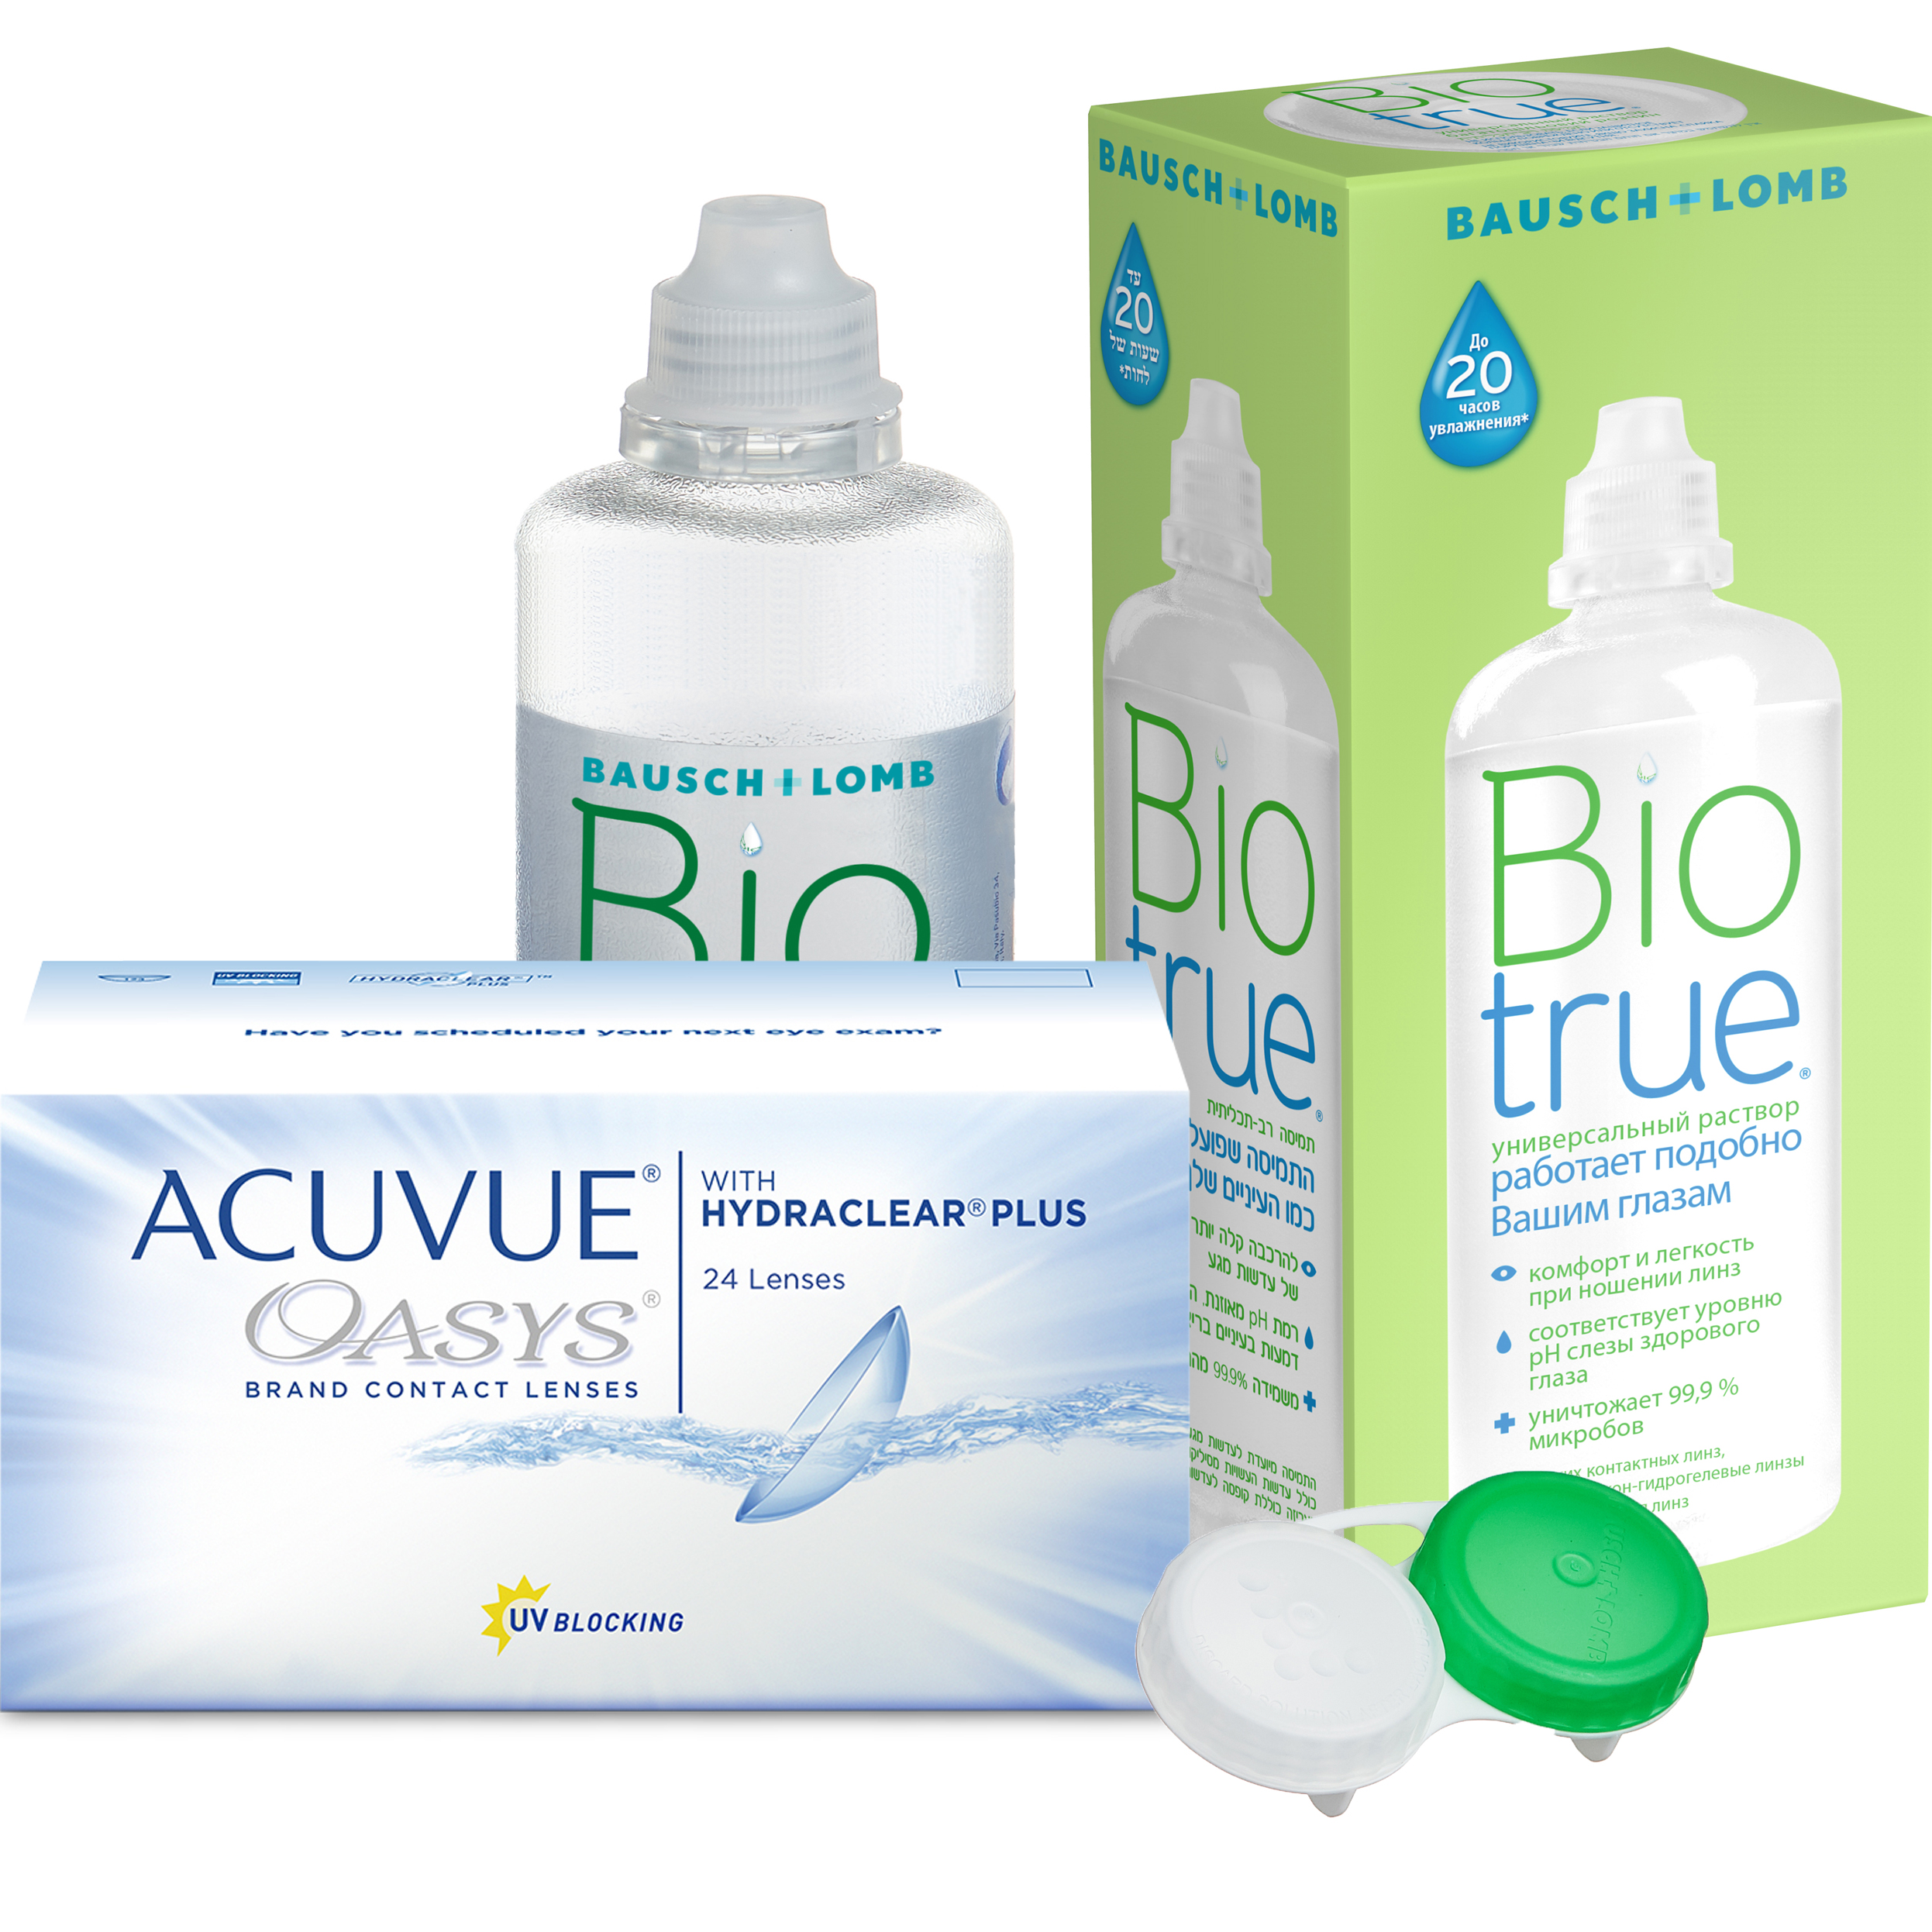 Купить Oasys with Hydraclear Plus 24 линзы + Biotrue, Контактные линзы Acuvue Oasys with Hydraclear Plus 24 линзы R 8.4 +1, 75 + Biotrue 300 мл